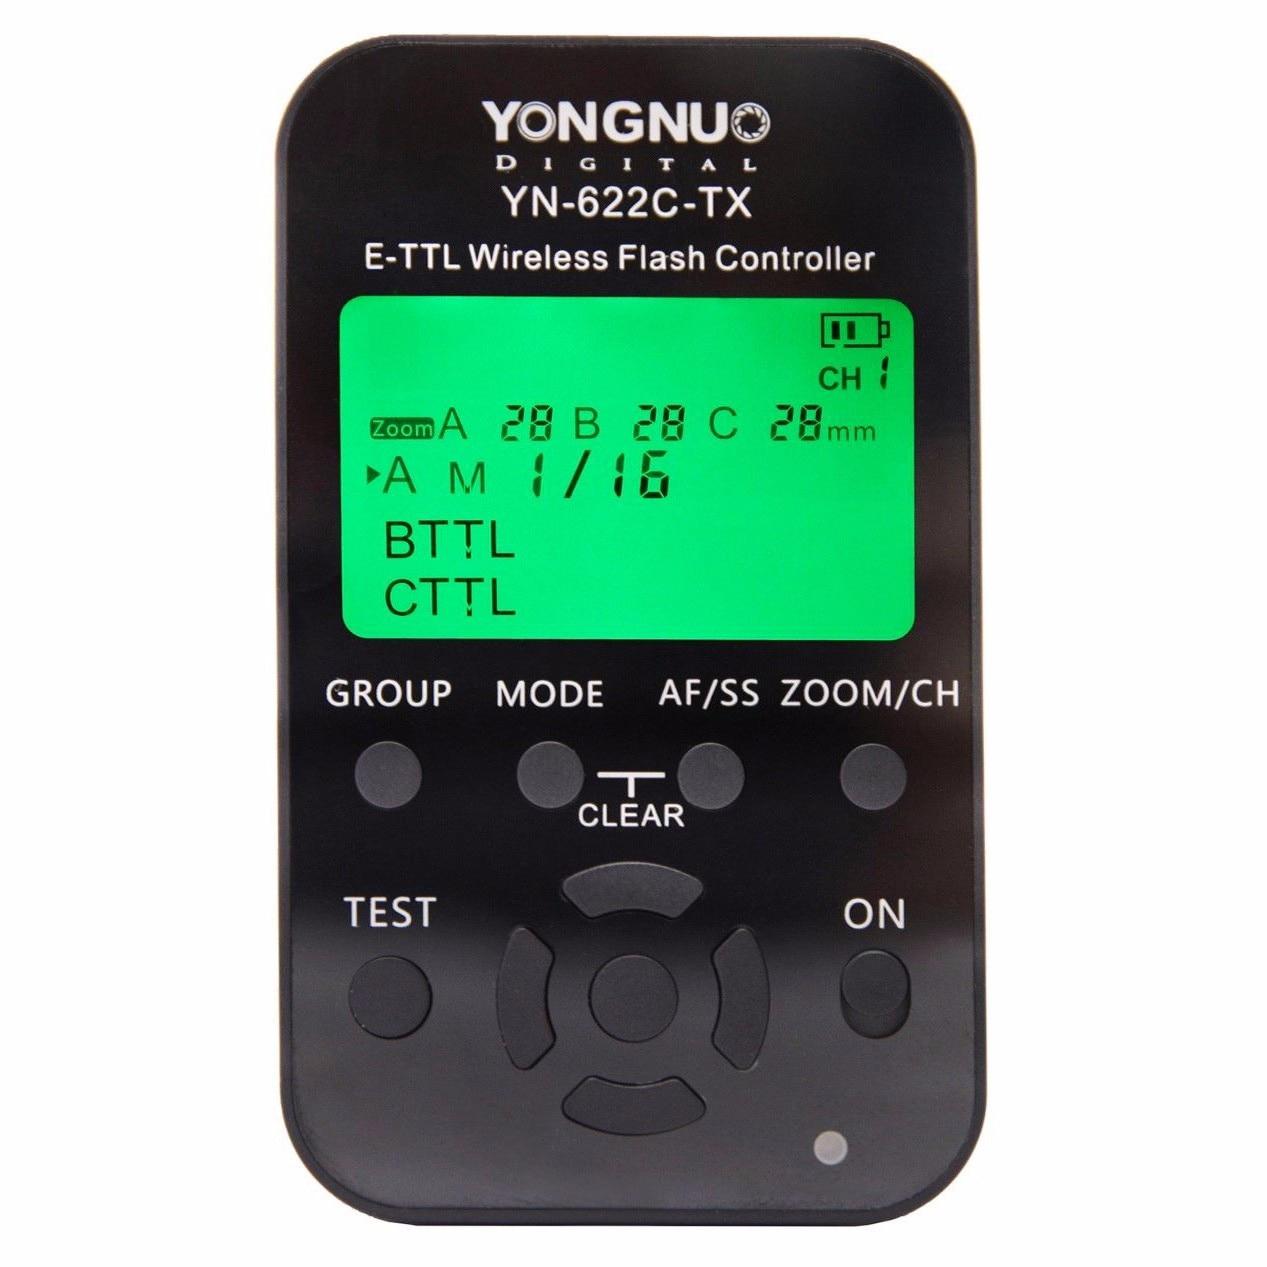 YONGNUO YN622C KIT YN622C-II-RX Single Transceiver Wireless E-TTL Flash Trigger Kit with LED Screen For Canon